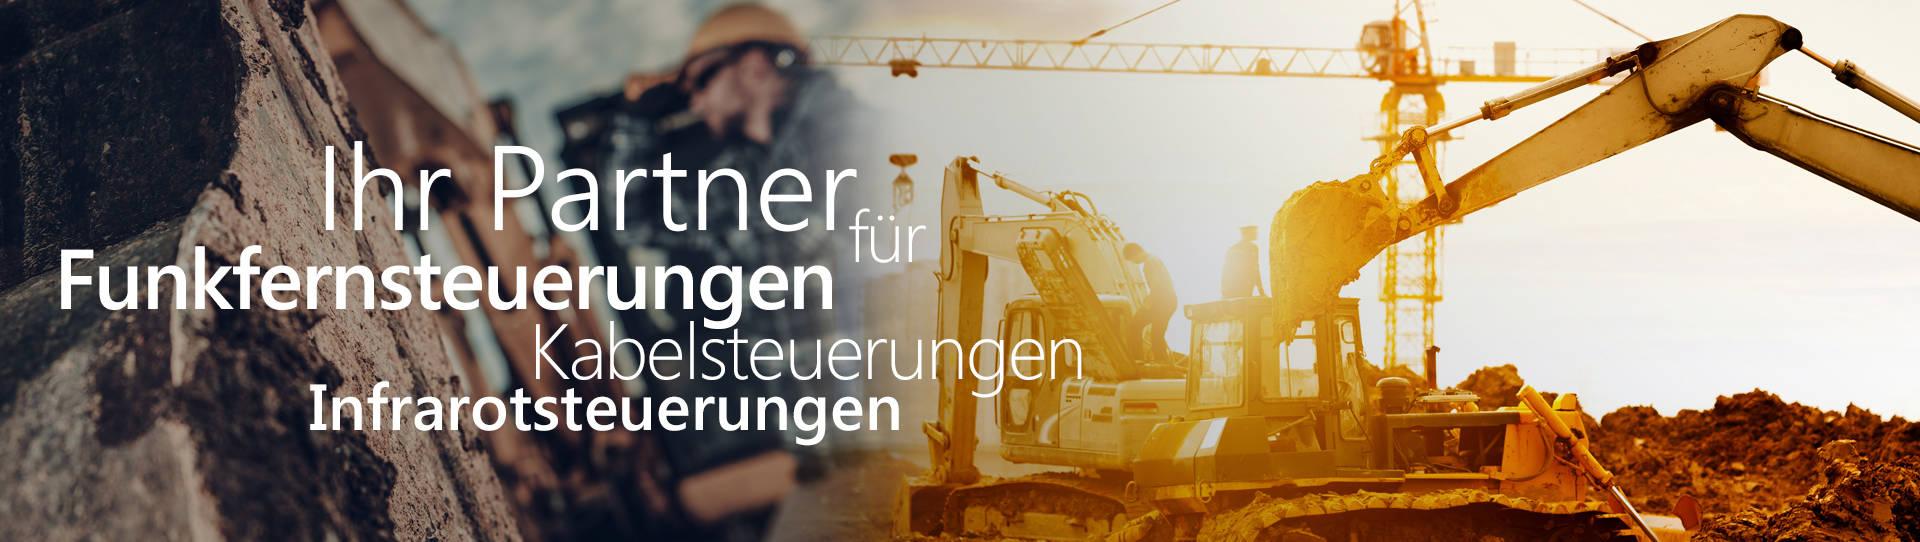 NBB Components and Funkfernsteuerungen